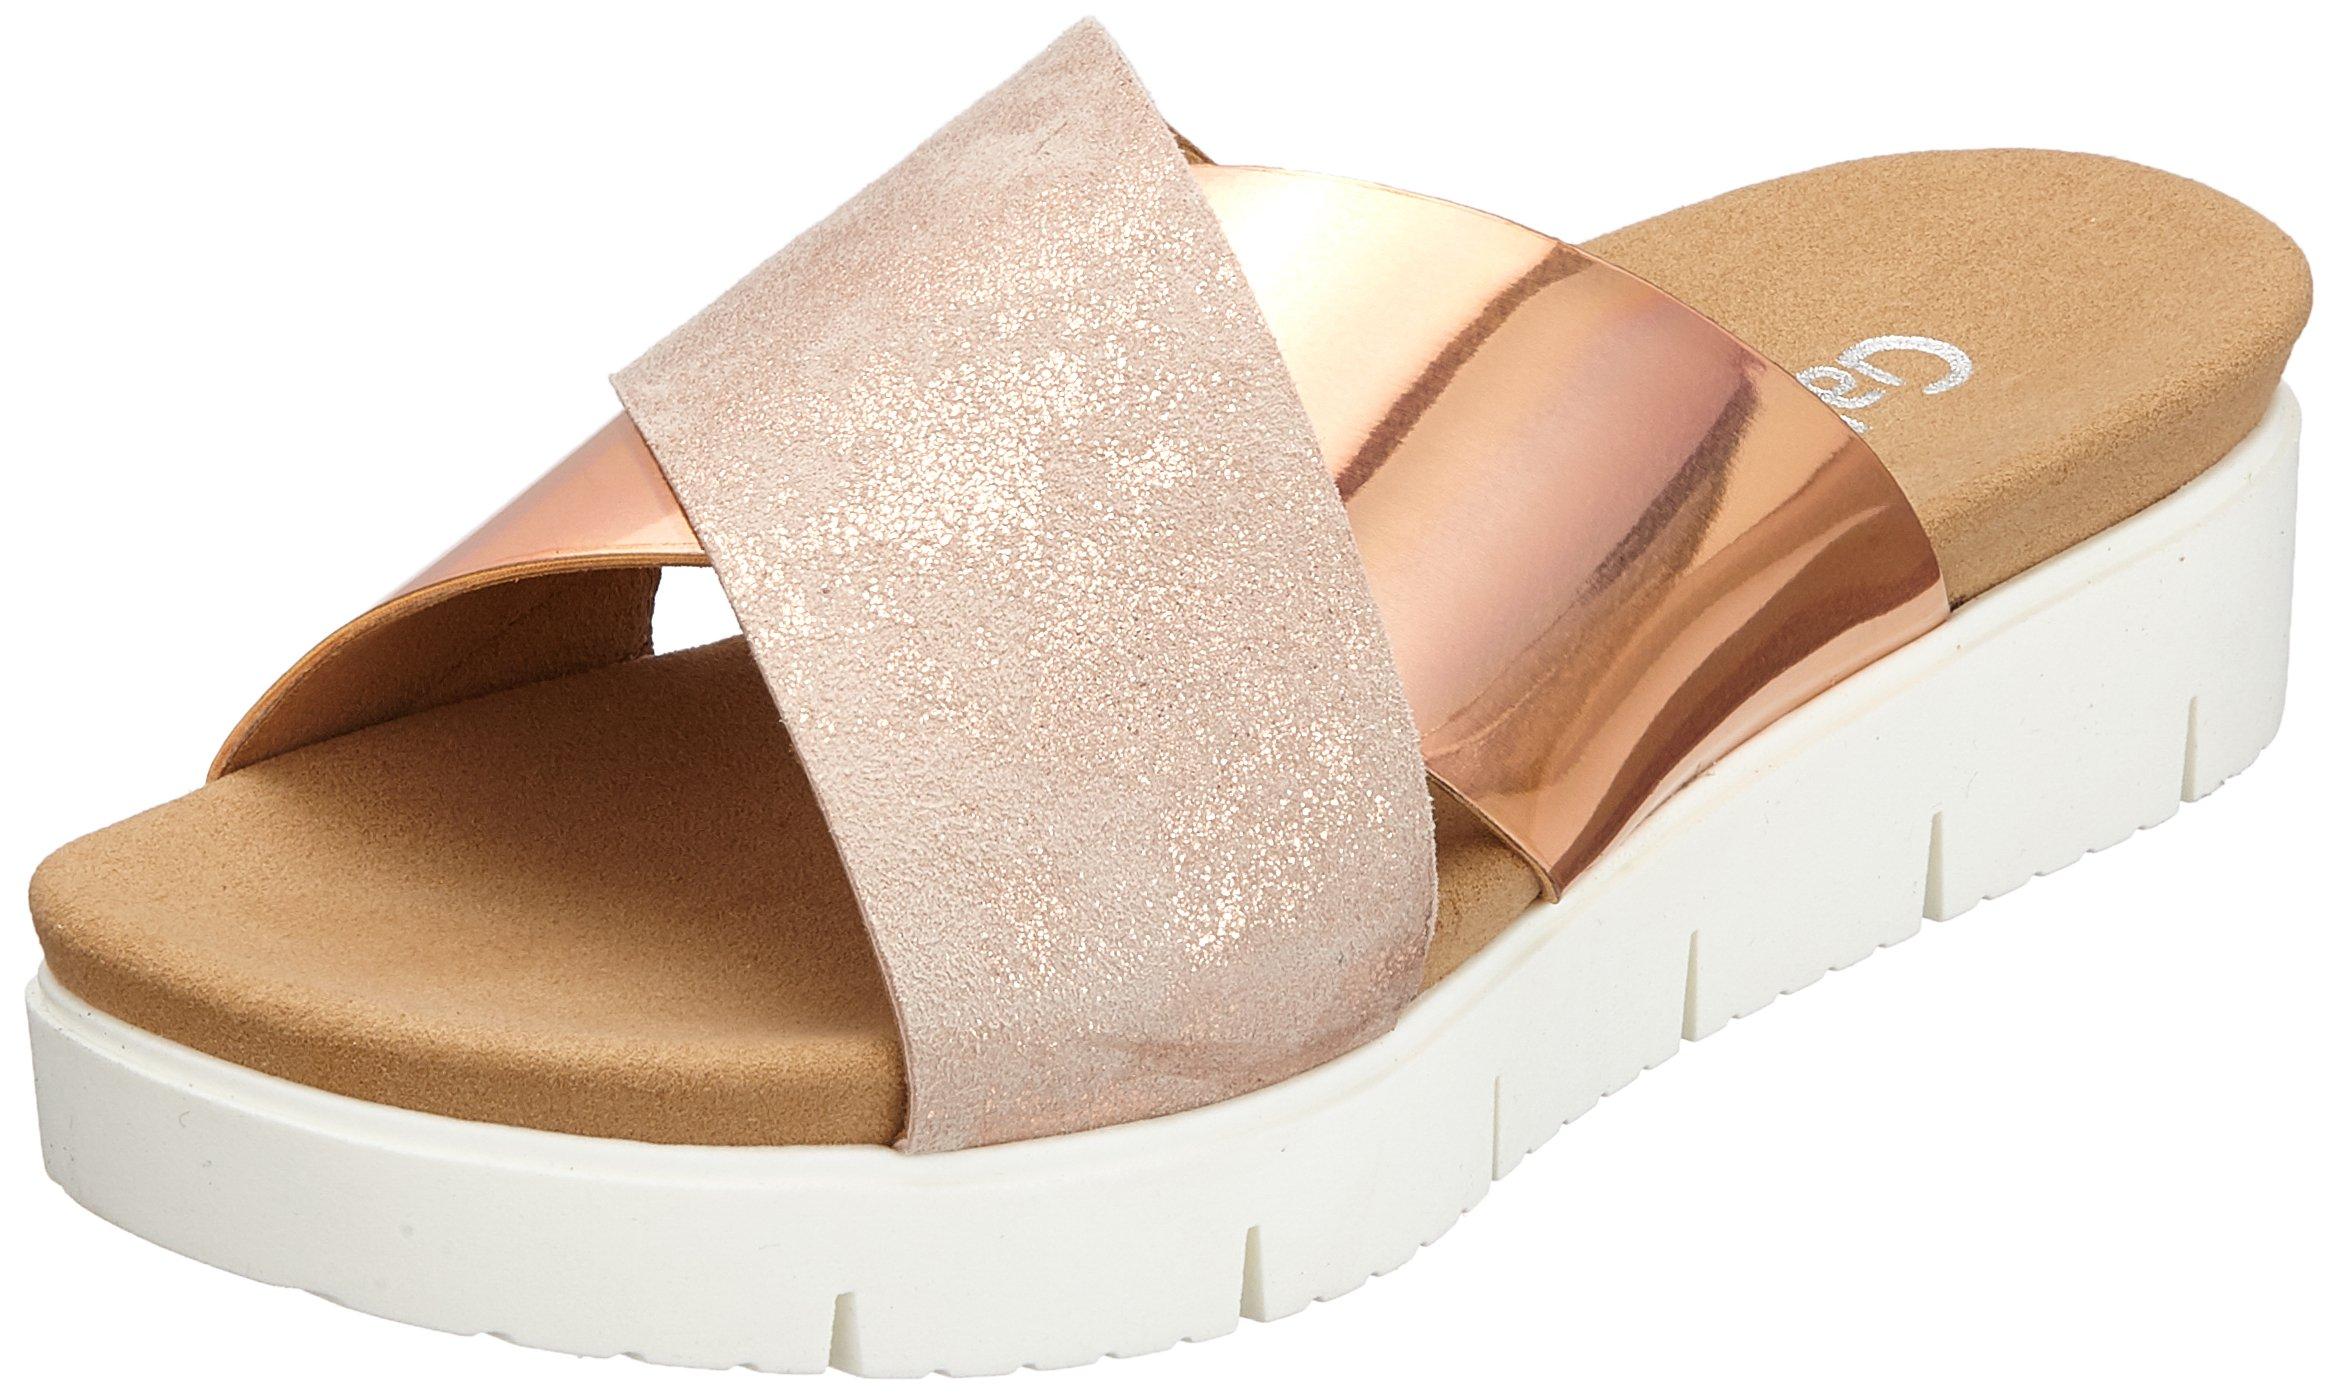 Comfort Shoes Gabor SportSandales Cheville Bride Eu FemmeMulticolorerame38 IyYbfgm76v